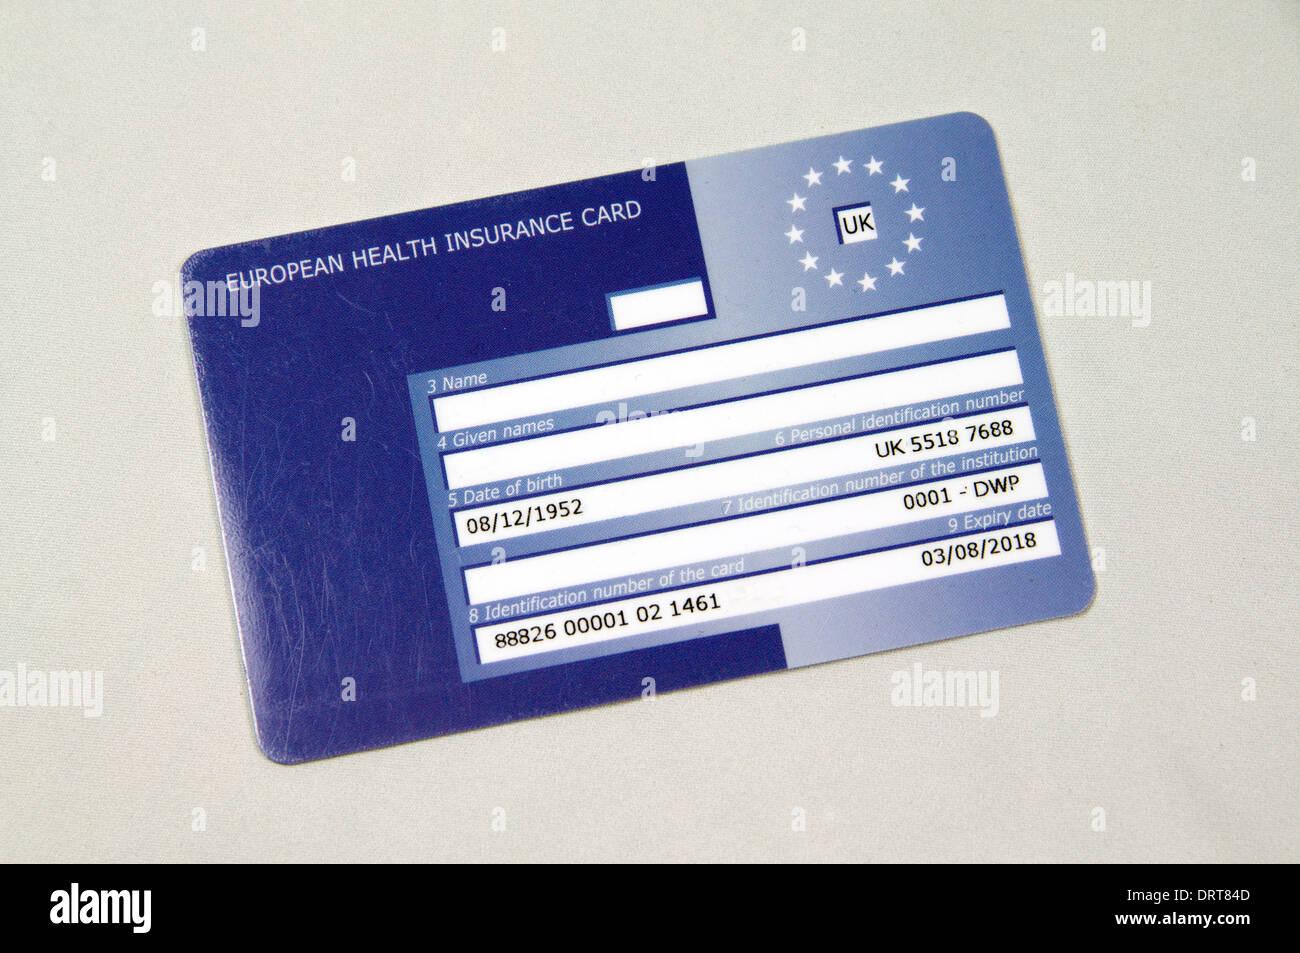 European Health Insurance Card. Stock Photo